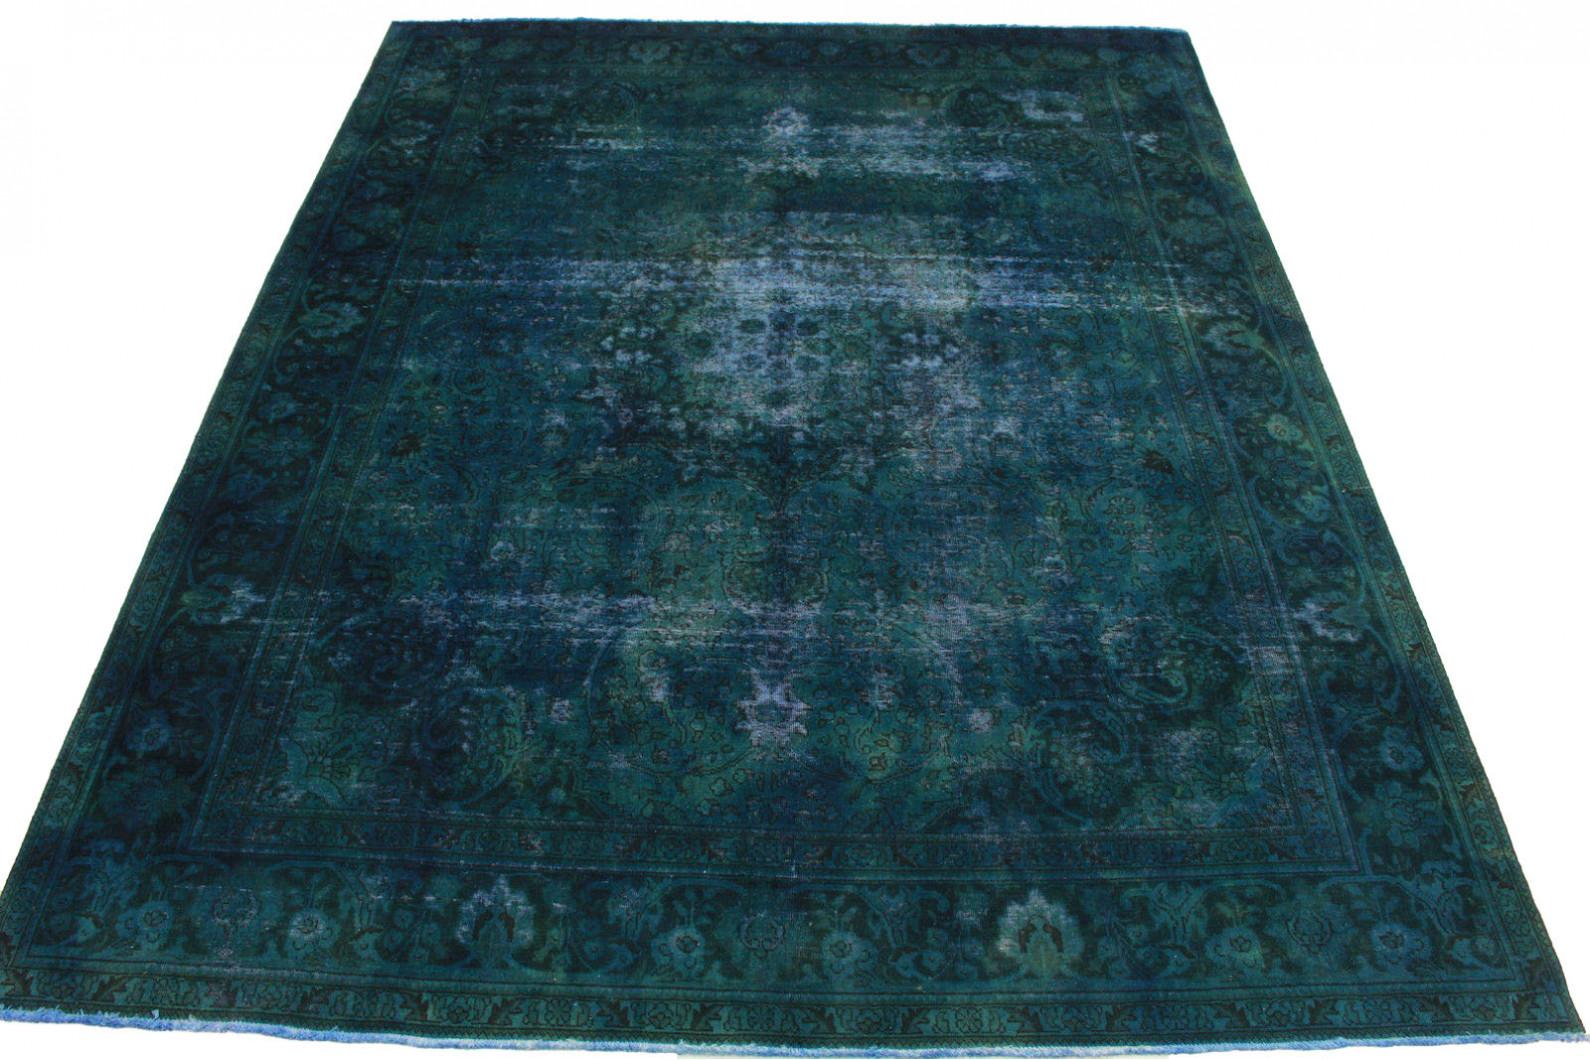 vintage teppich blau t rkis in 380x300cm 1001 5036 bei. Black Bedroom Furniture Sets. Home Design Ideas